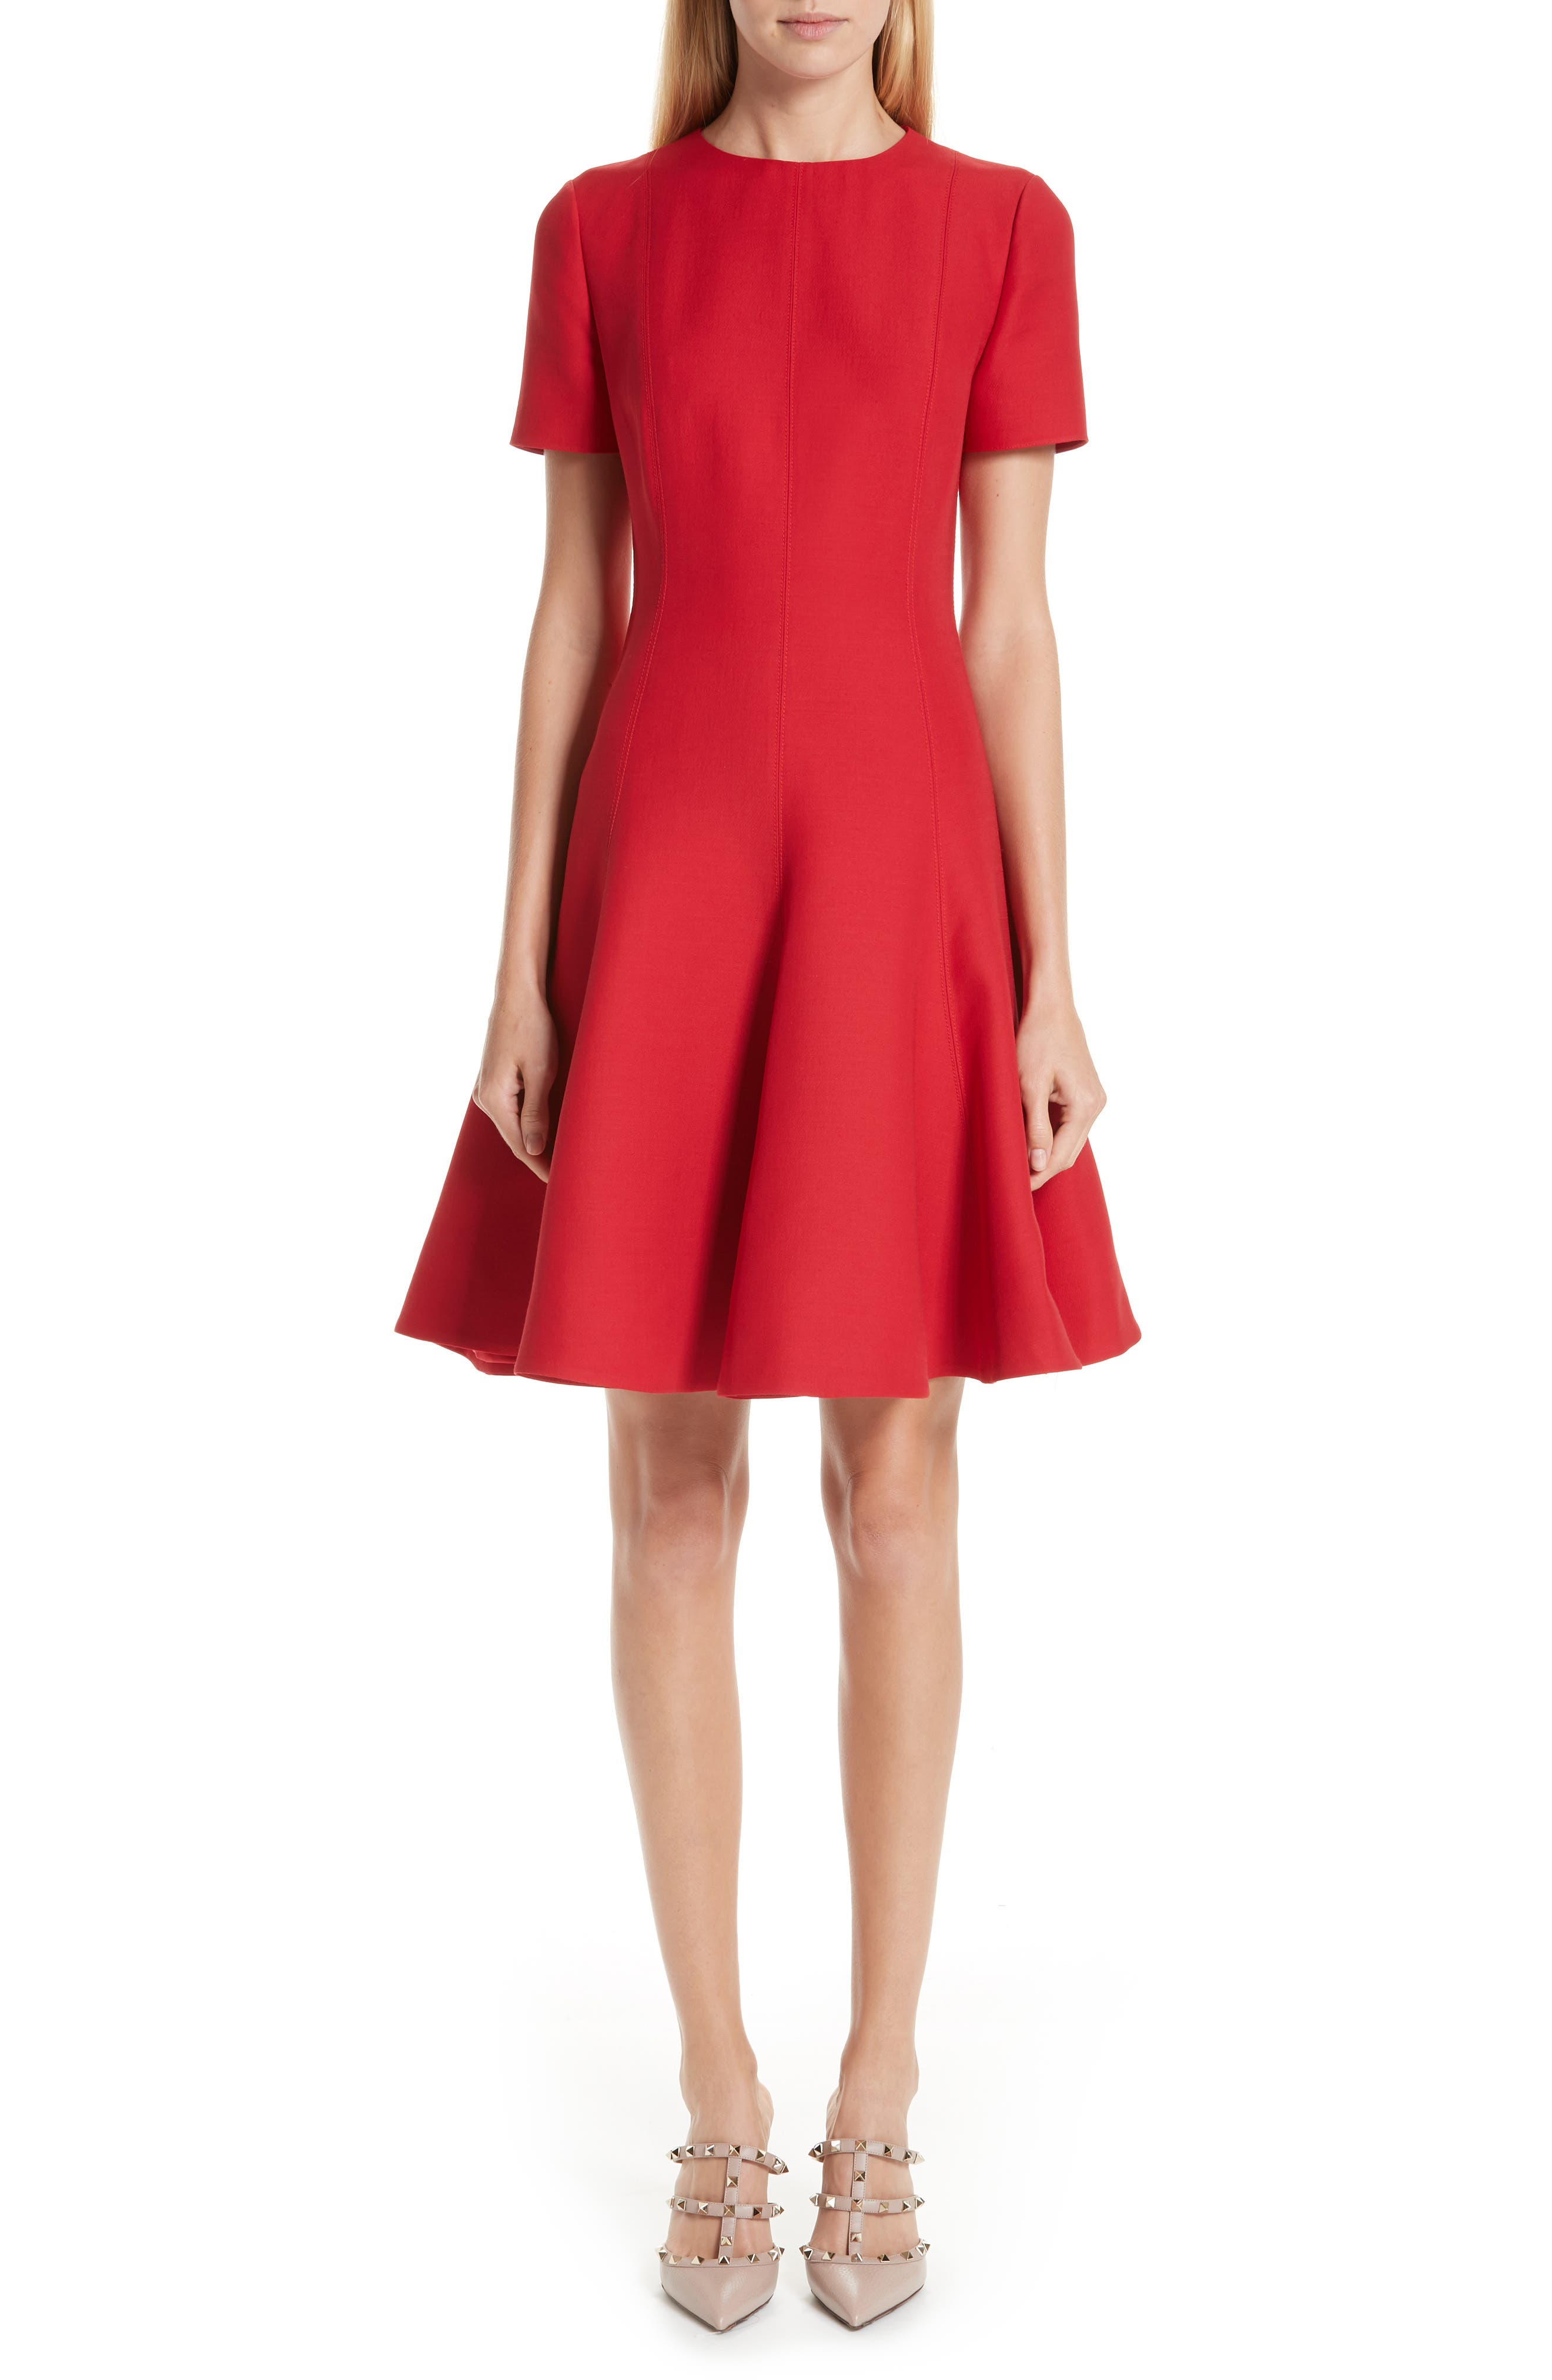 Valentino Crepe A-Line Dress, Red